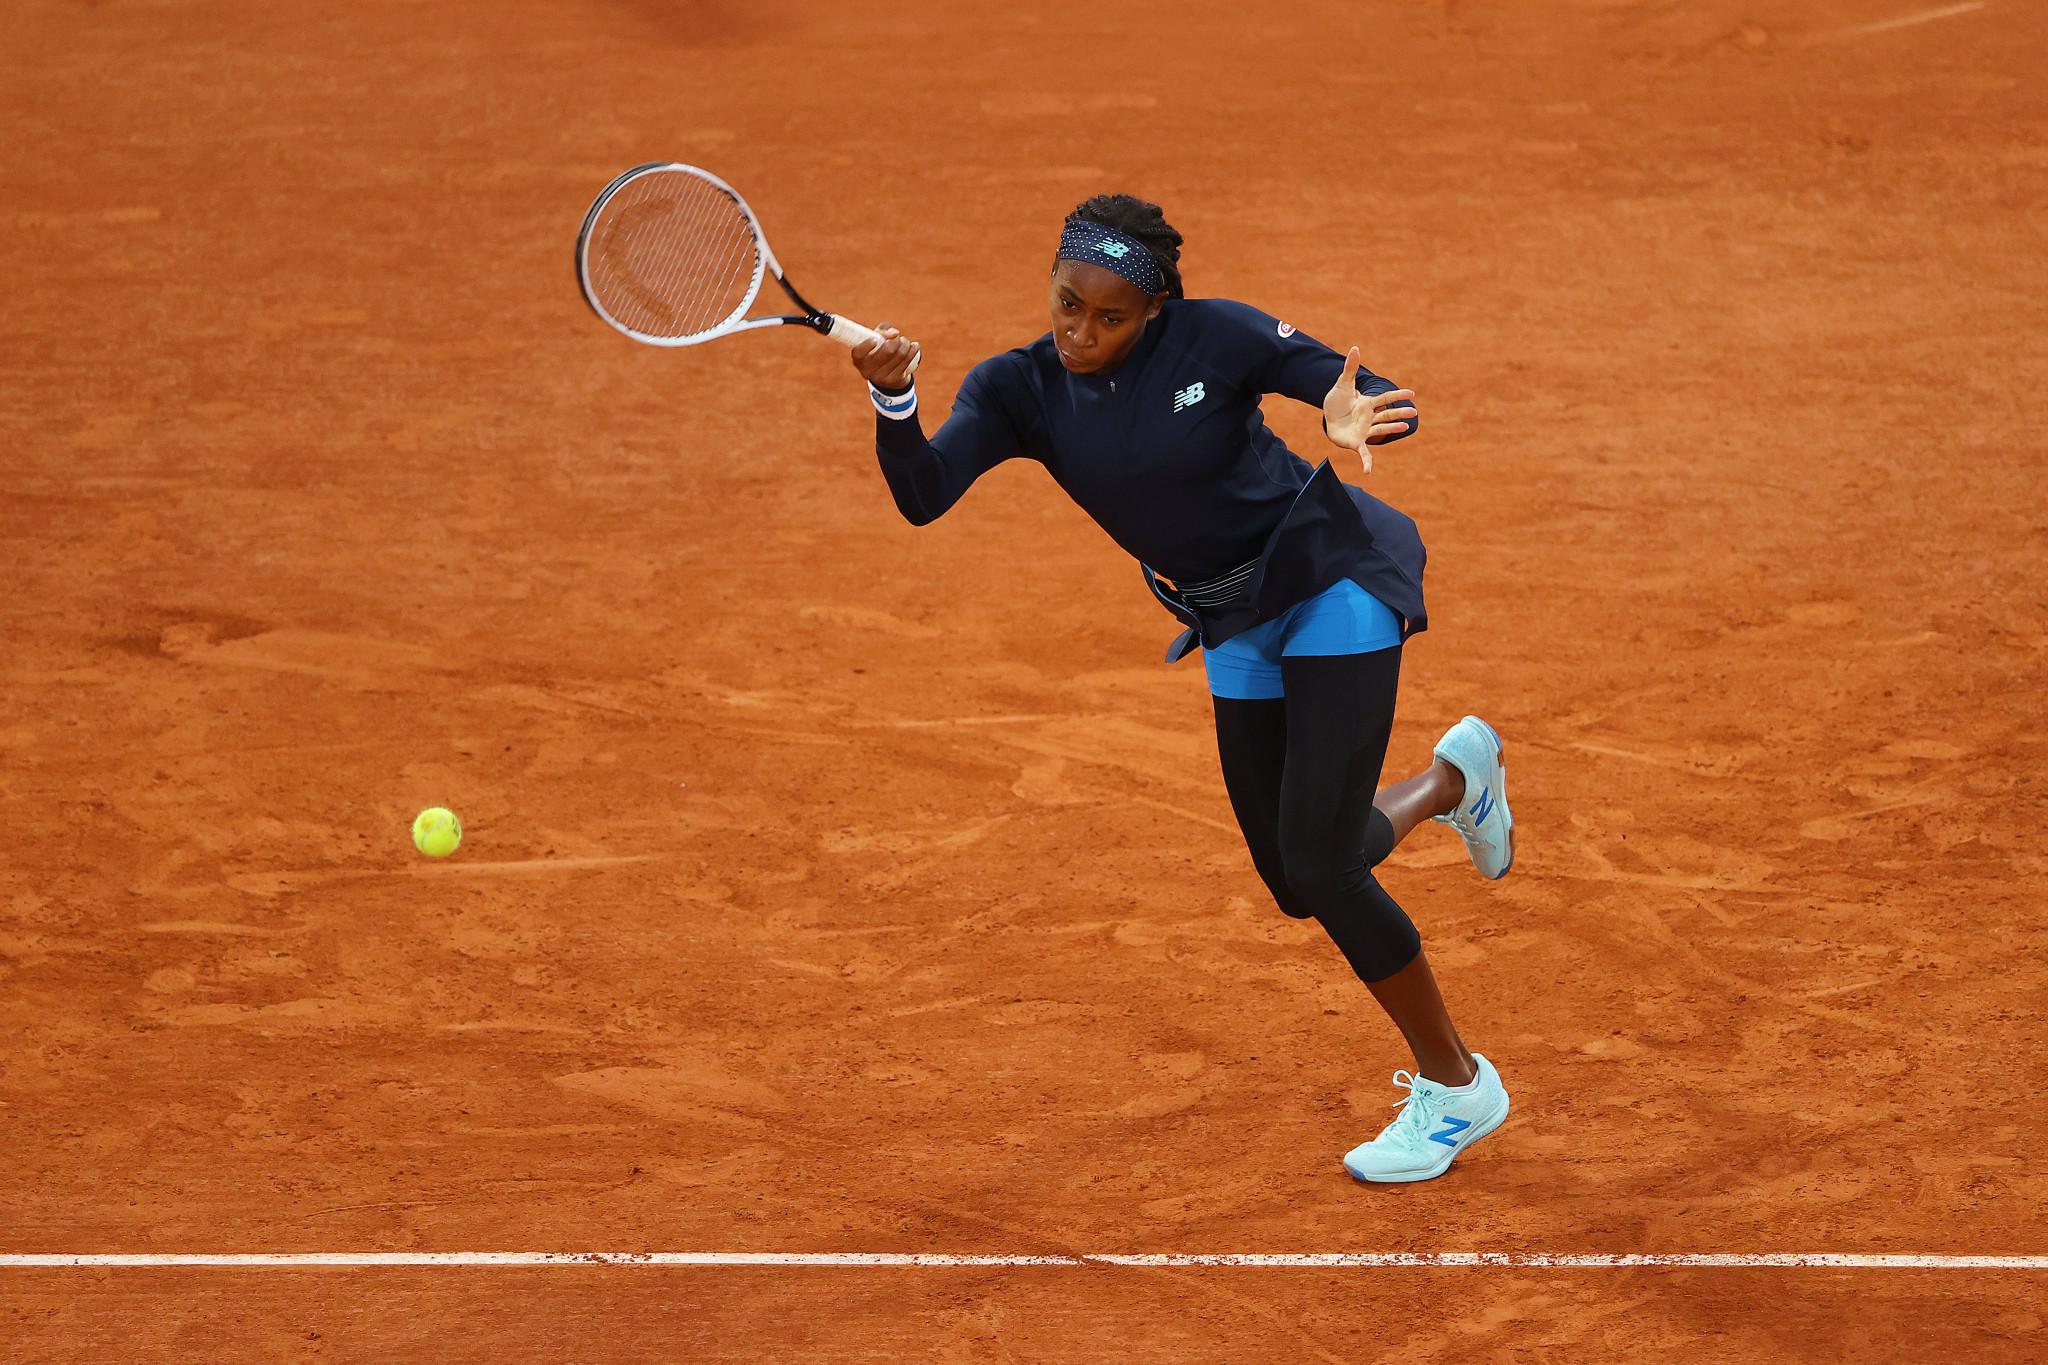 Gauff beats ninth seed Konta as French Open gets underway in Paris